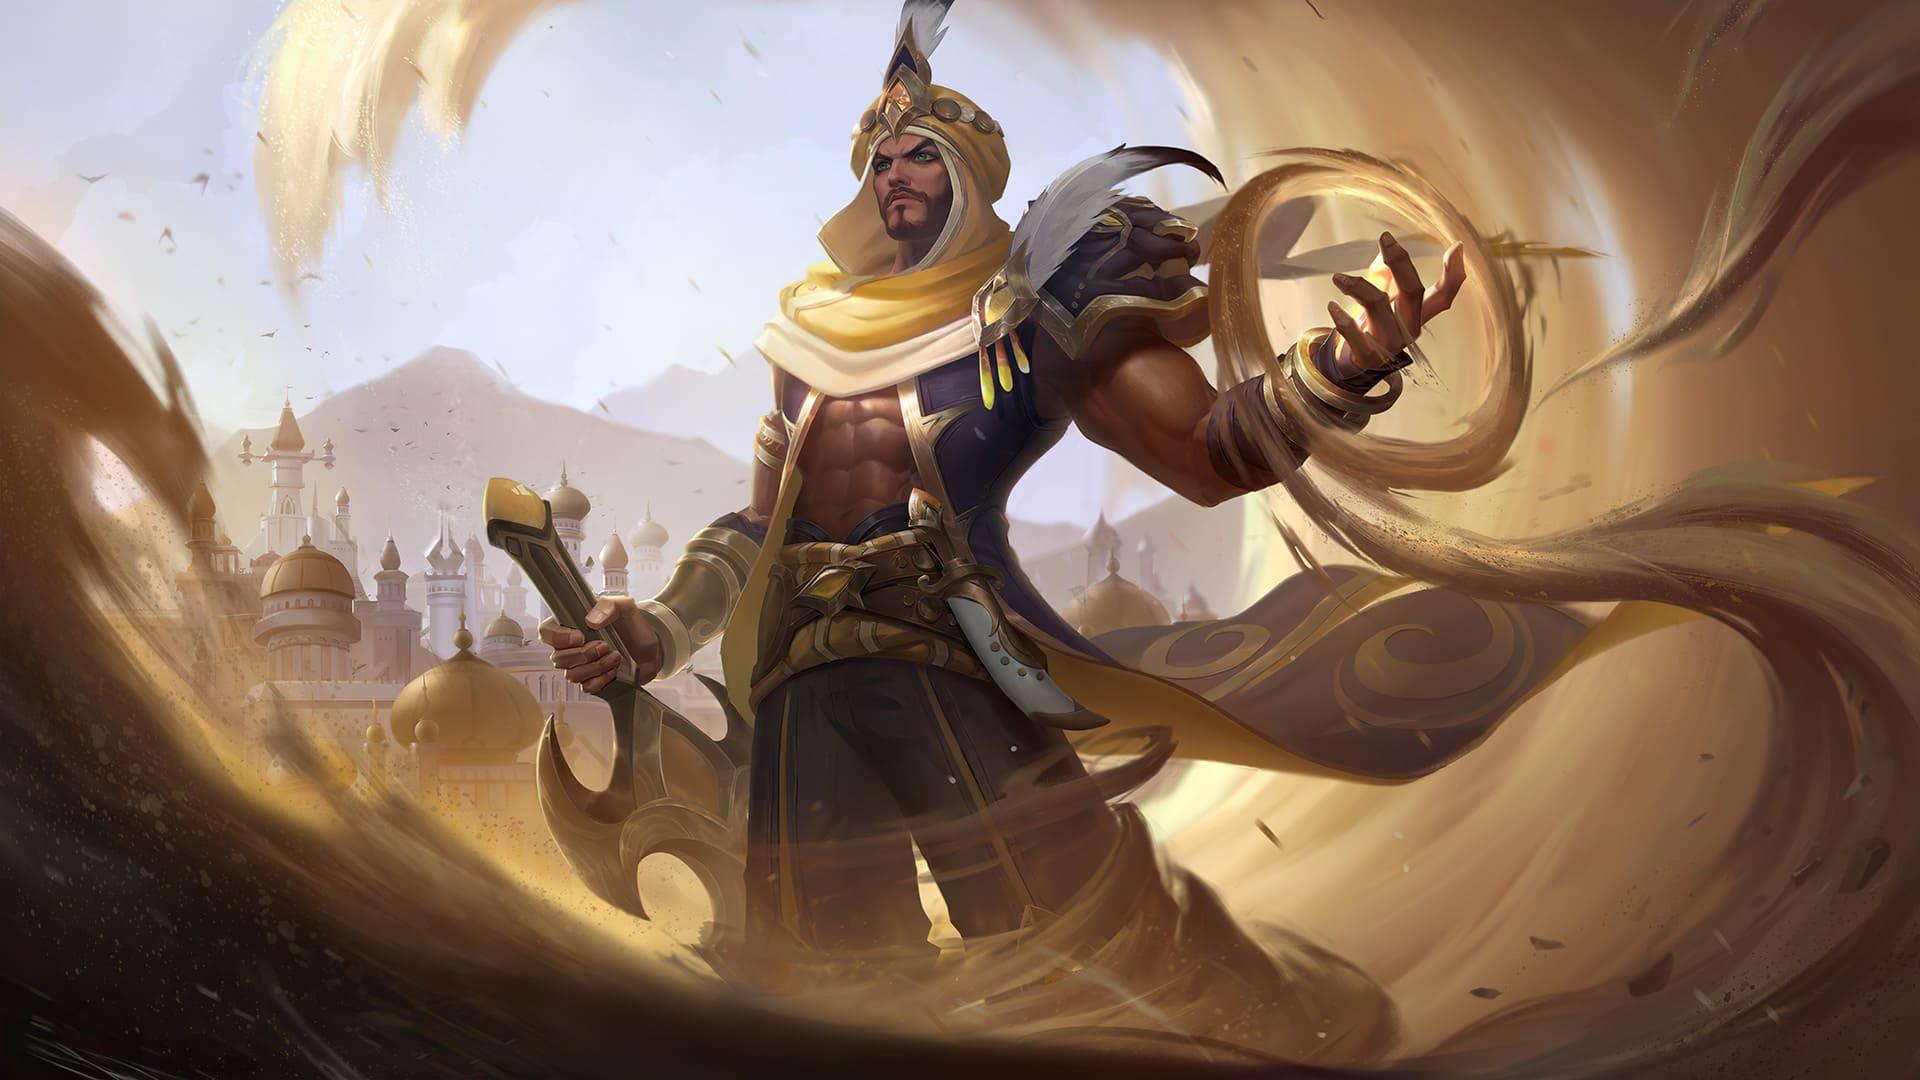 Khaleed prince of sand skin mobile legends hd for PC hobigame